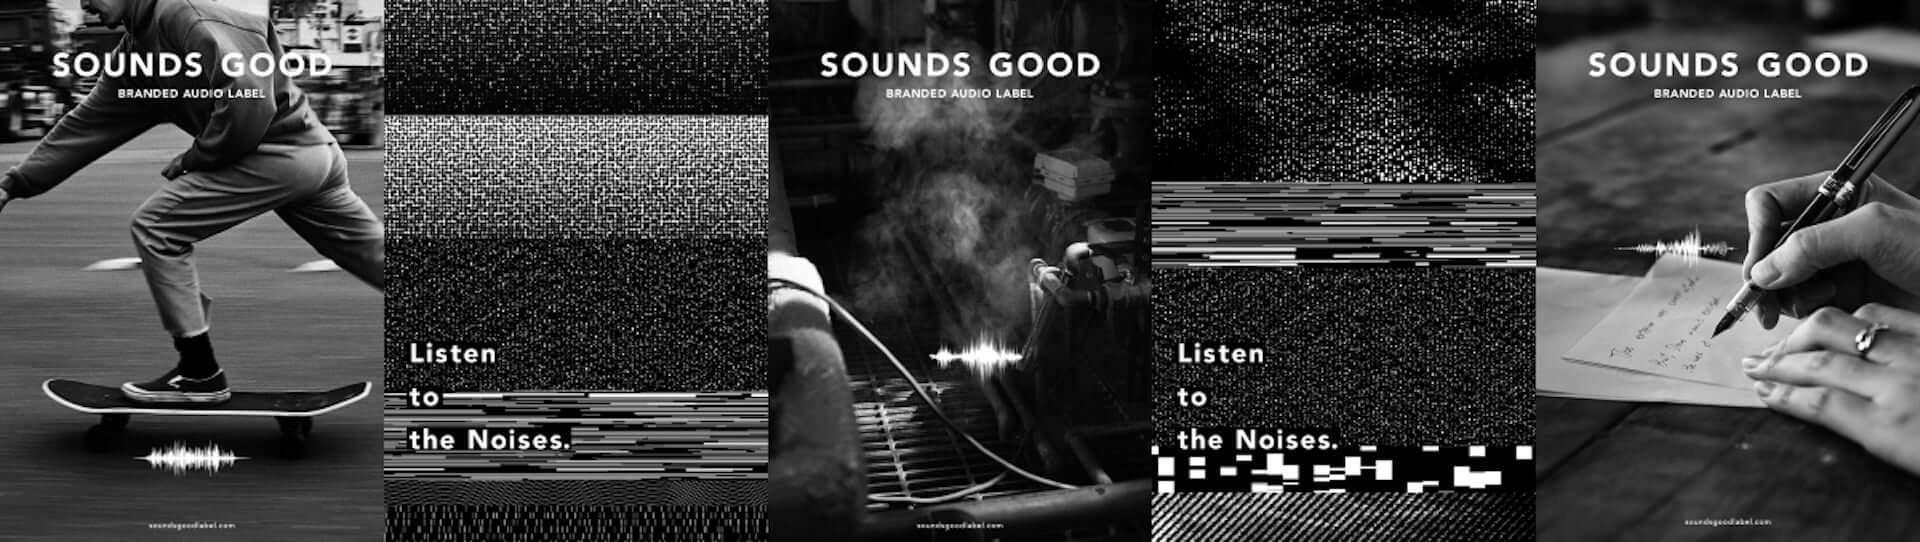 SOUNDS GOOD®とblock.fmによるコンピアルバムがリリース|80KIDZ、TAAR、Shin Sakiuraの楽曲が収録 music200603_feelsoundsgood_12-1920x542